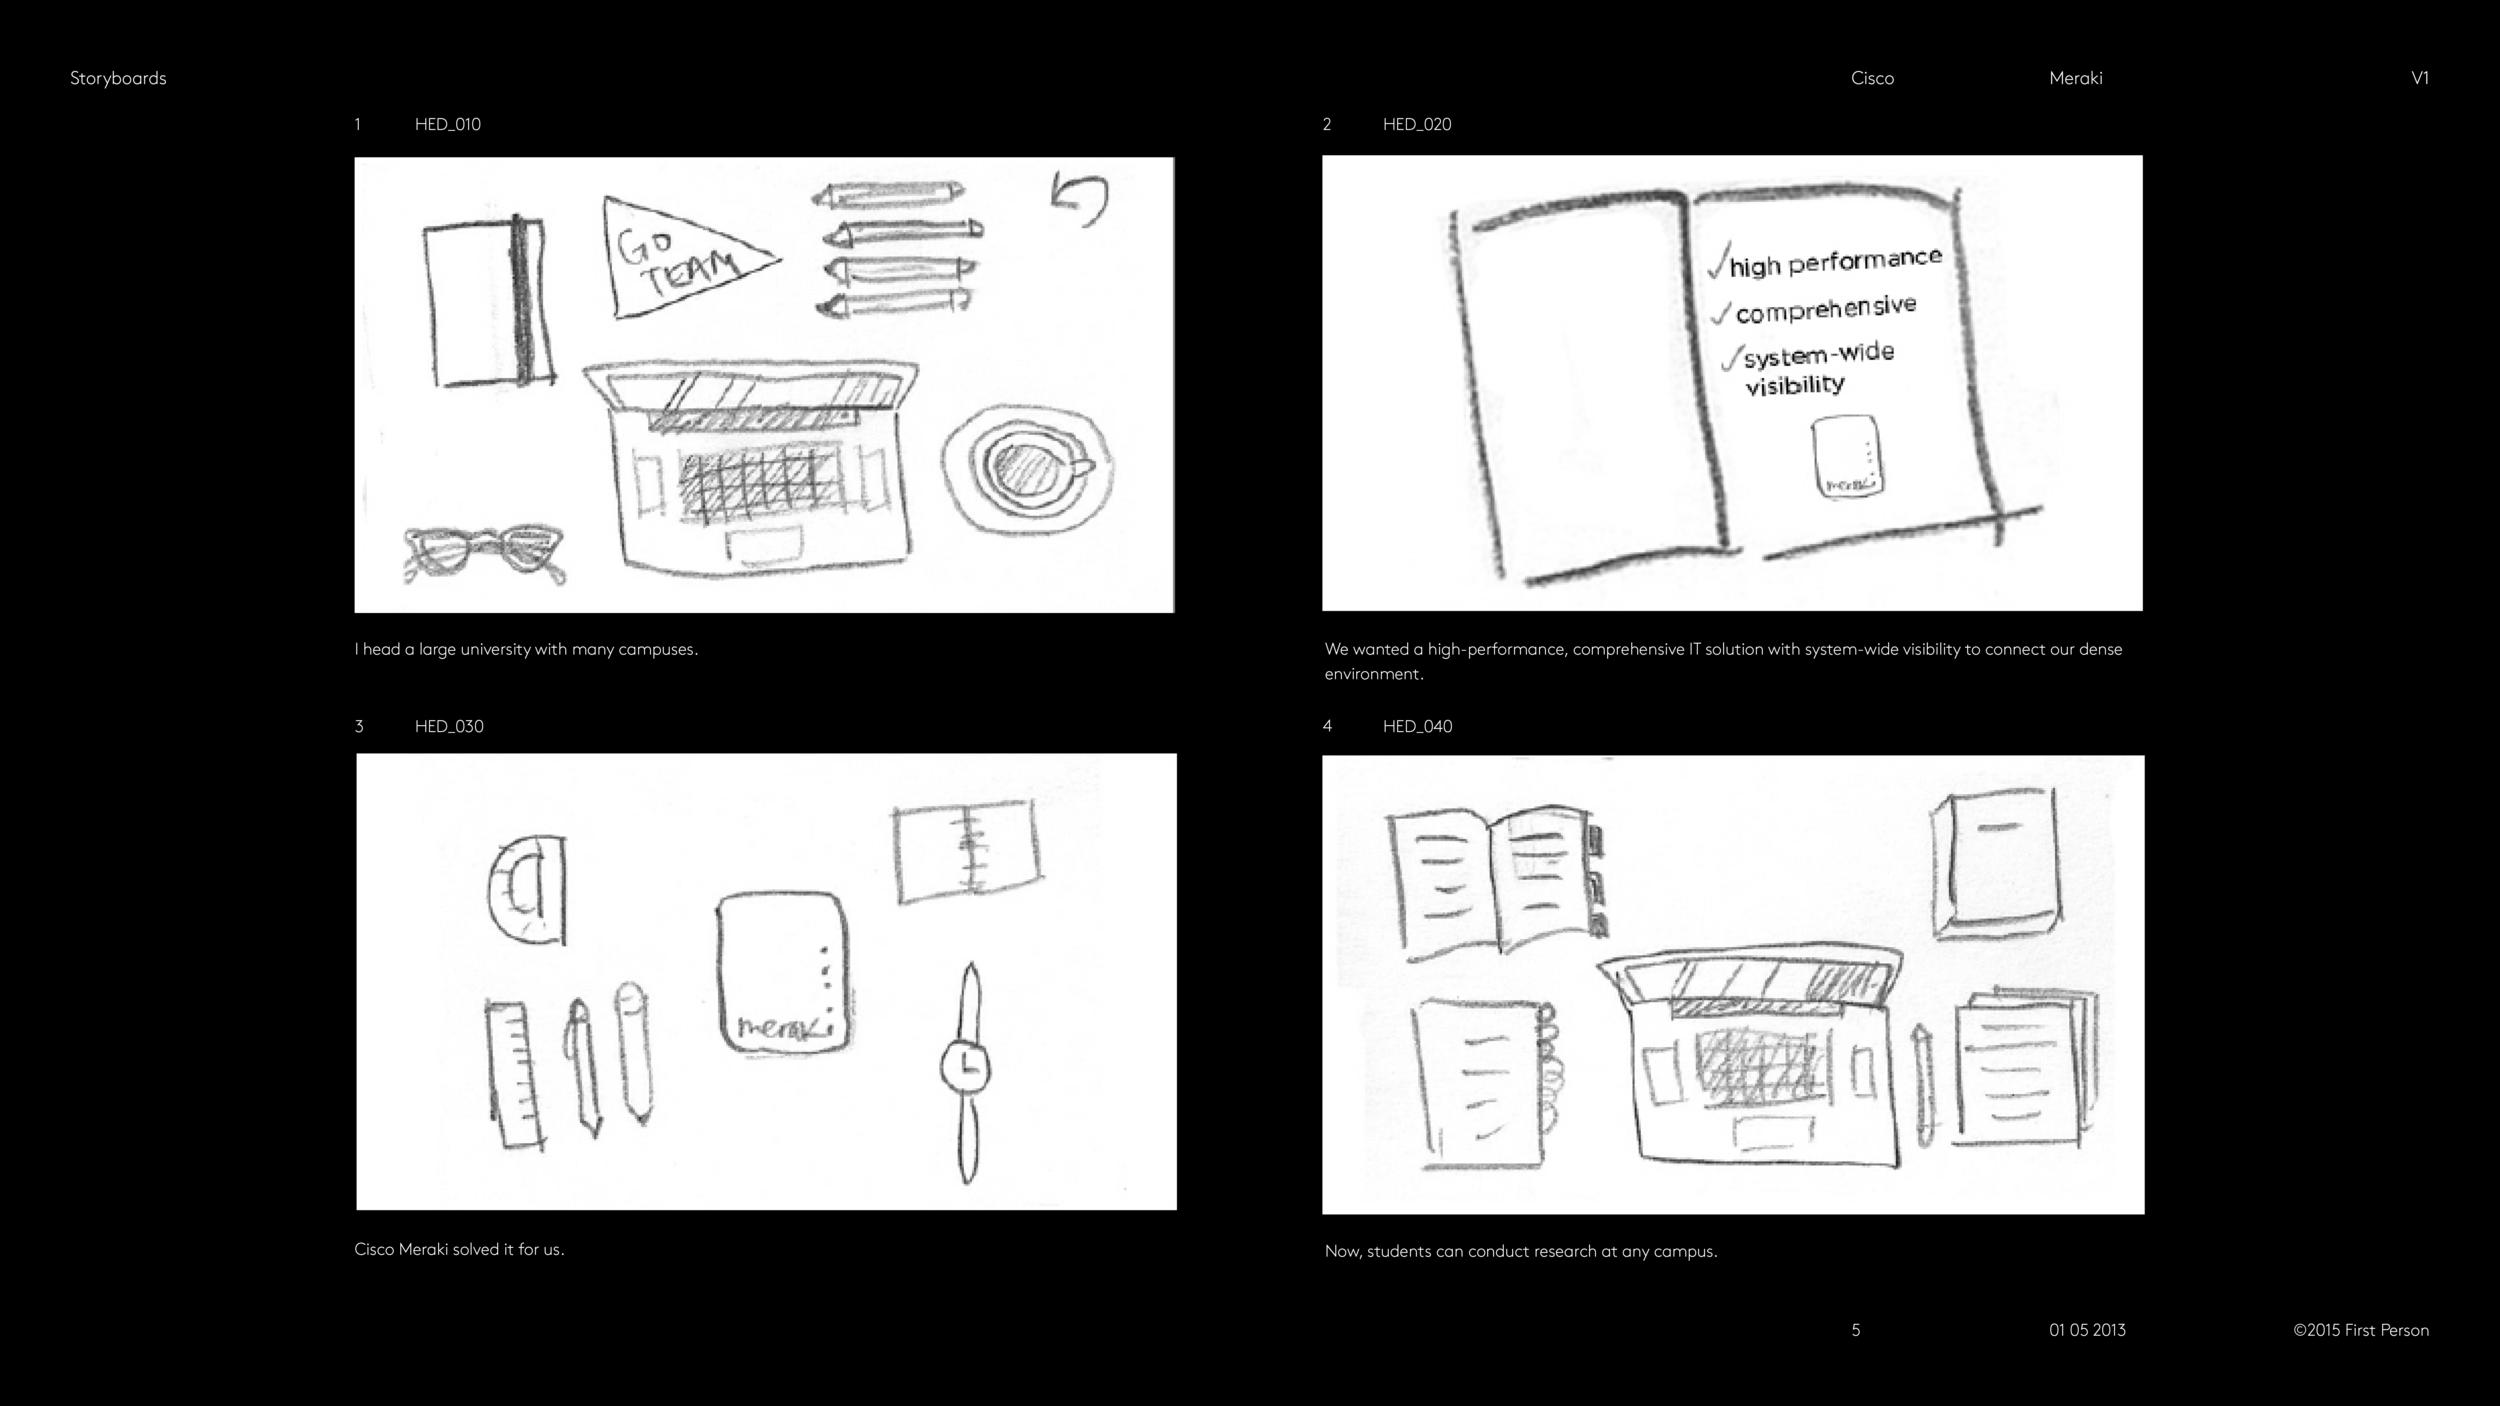 3431_CiscoMeraki_Storyboards_v01-5.png